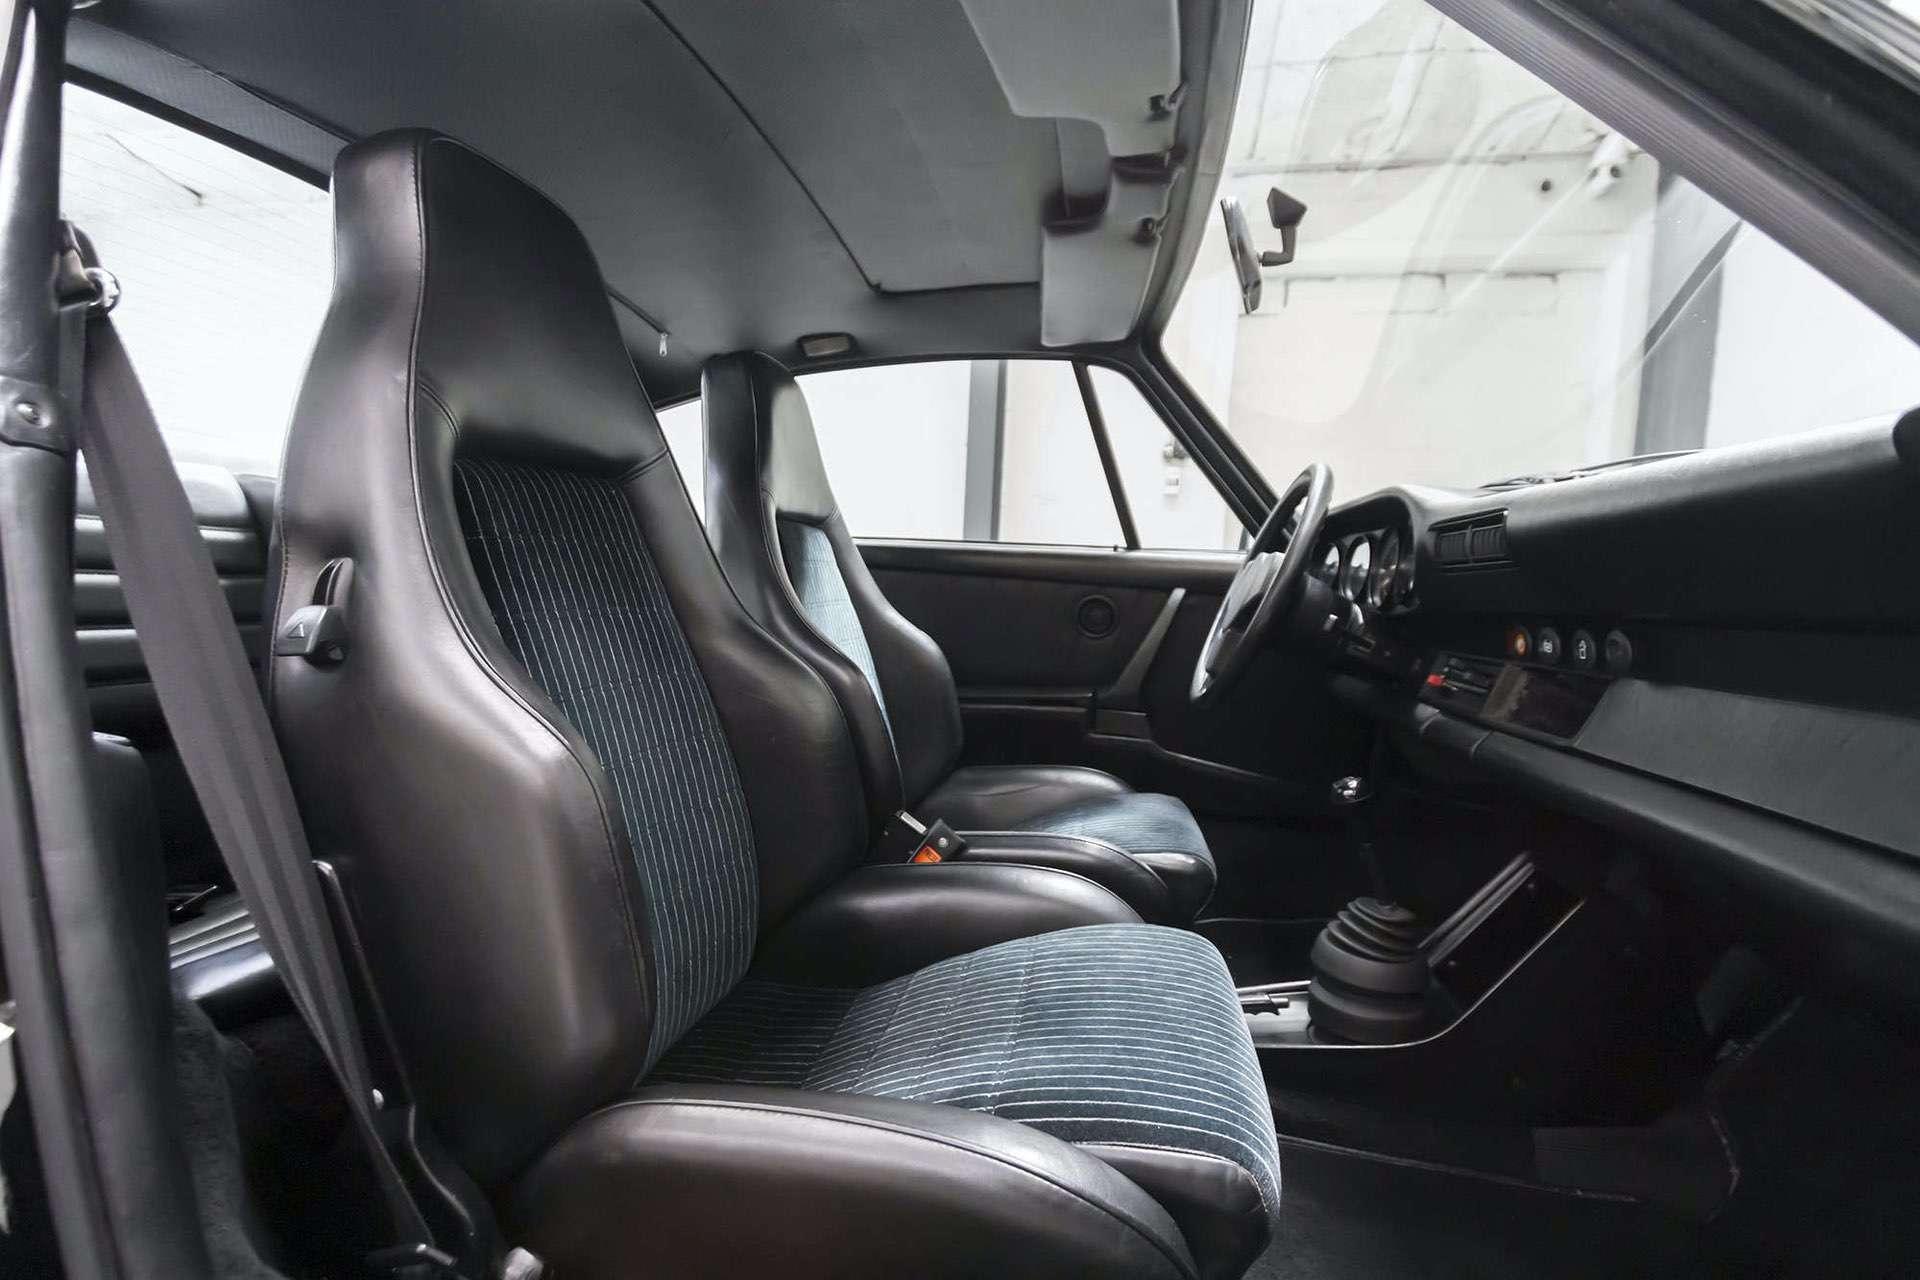 Porsche_911_930_Turbo_0025